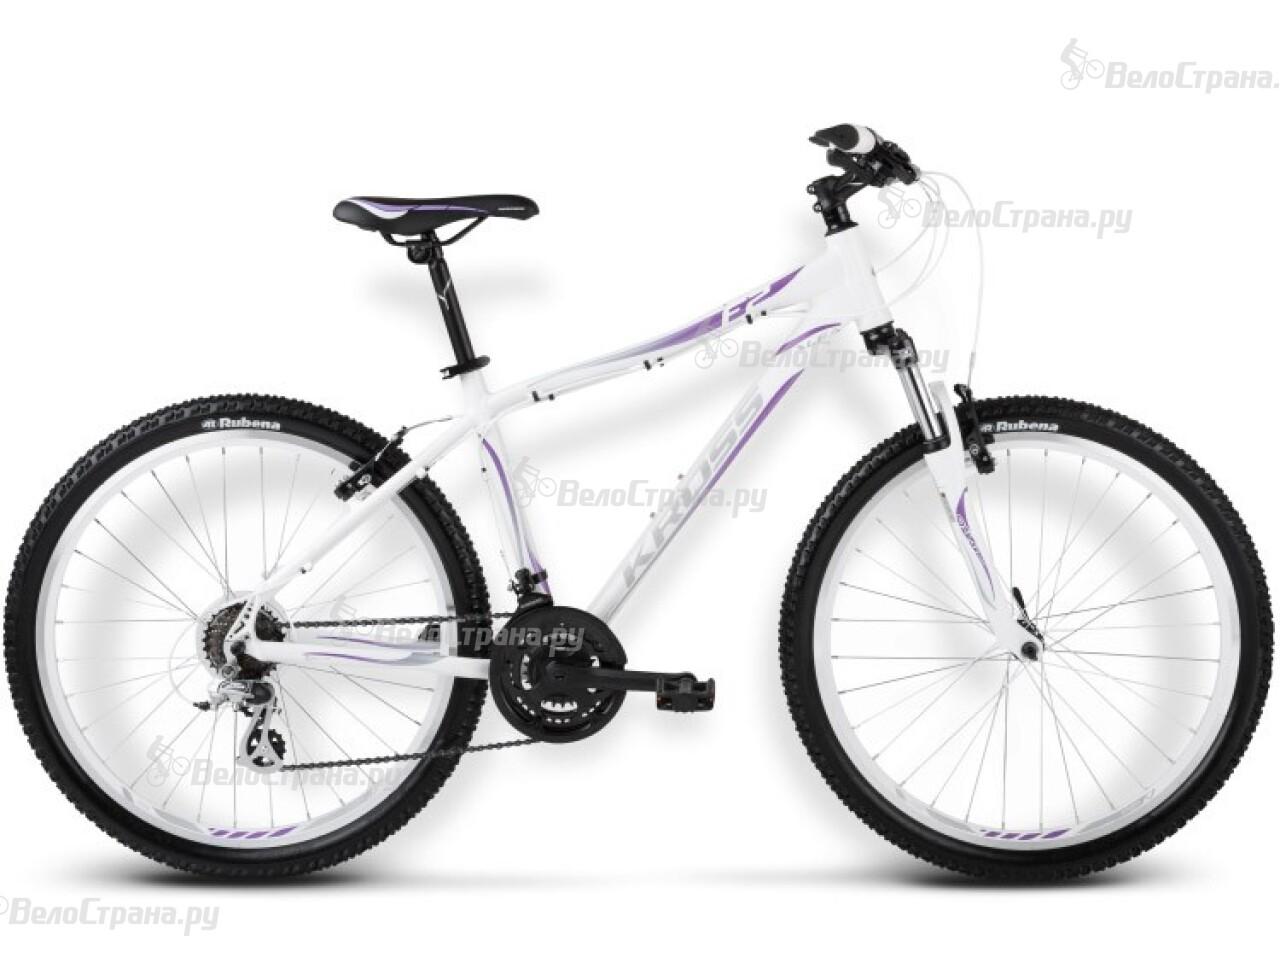 Велосипед Kross Lea F2 (2015) велосипед kross lea f4 2017